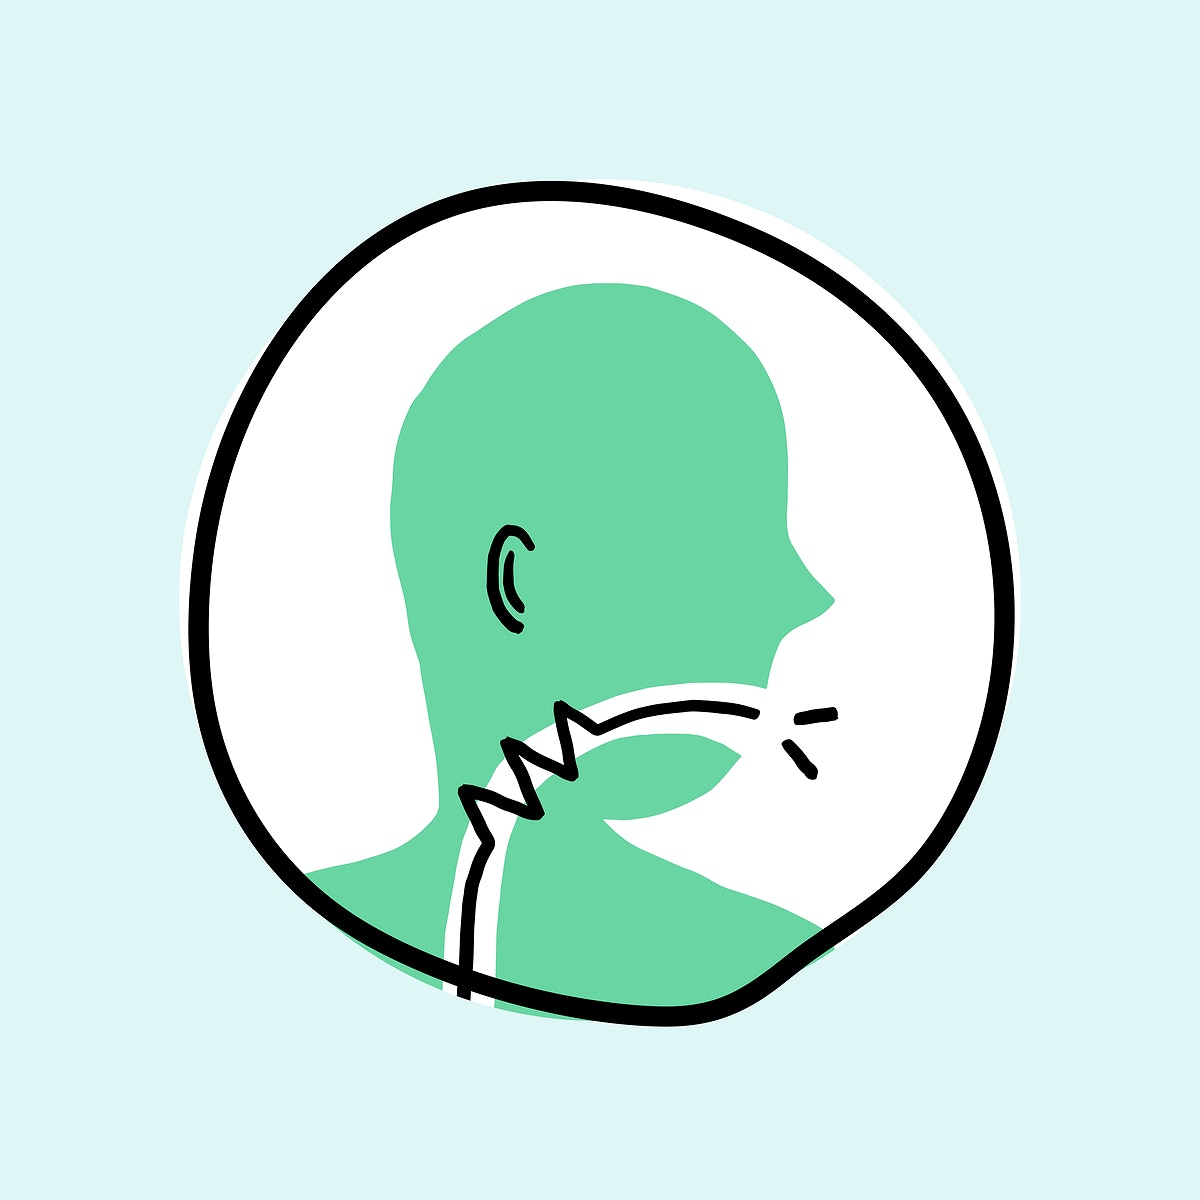 Sore throat coronavirus symptom icon vector